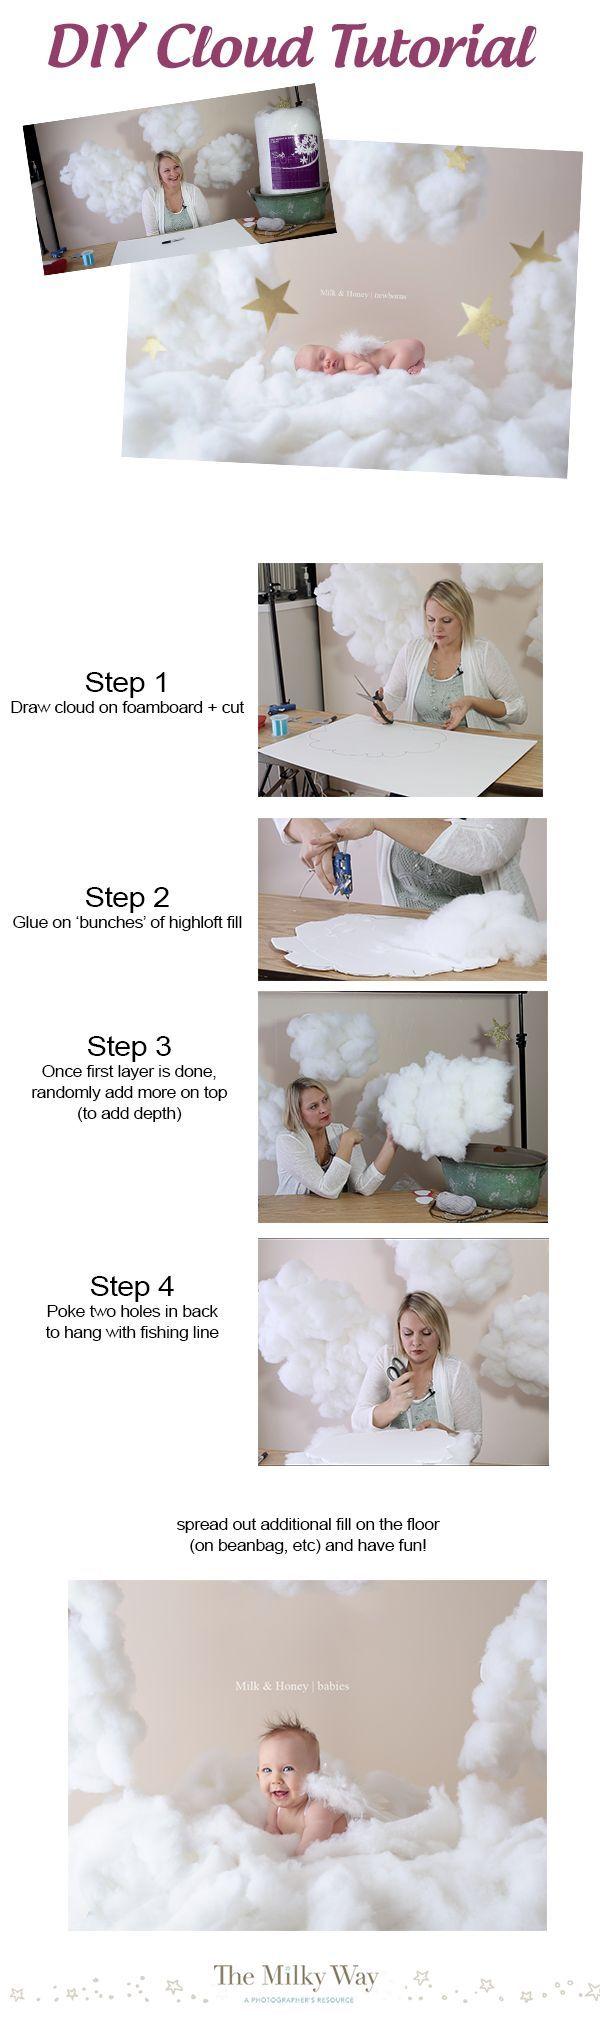 Fun DIY Cloud Tutorial (takes less than 20 minutes!) - themilkway.ca: